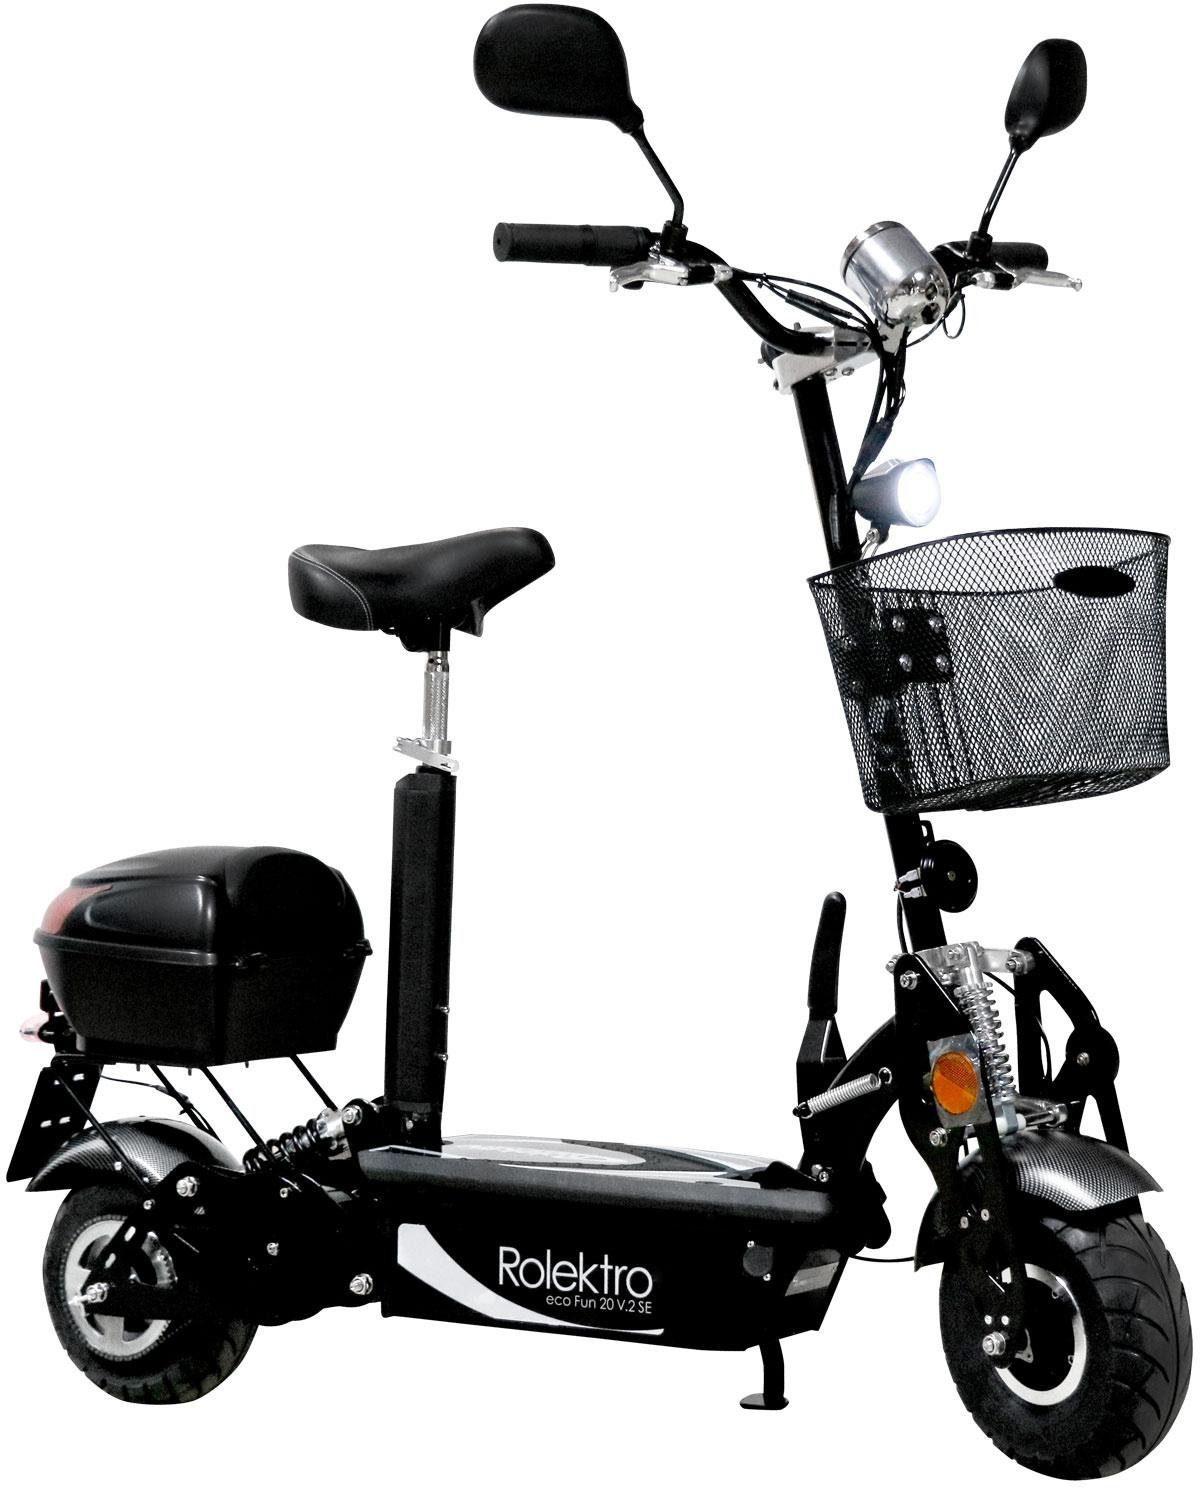 Rolektro E-Scooter »Rolektro eco-Fun 20 V.2 SE Plus, Schwarz«, 500 W, 20 km/h